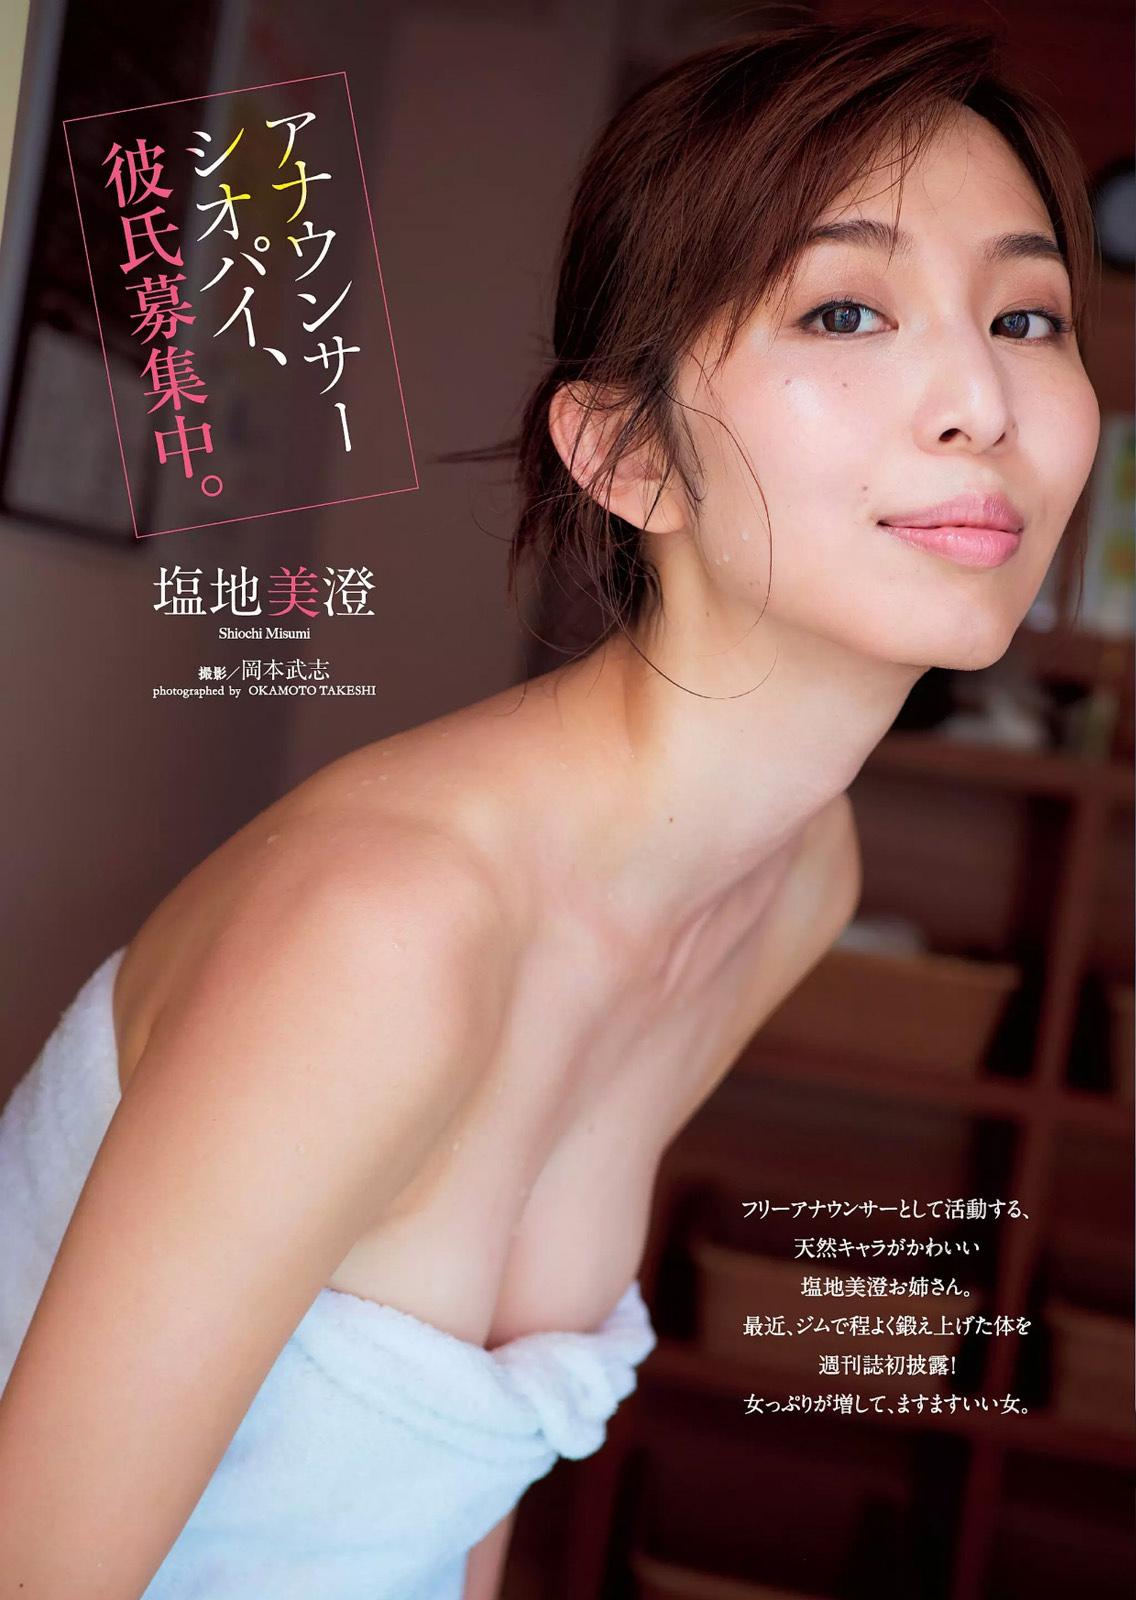 Misumi Shiochi 塩地美澄, Weekly Playboy 2017 No.39-40 (週刊プレイボーイ 2017年39-40号)